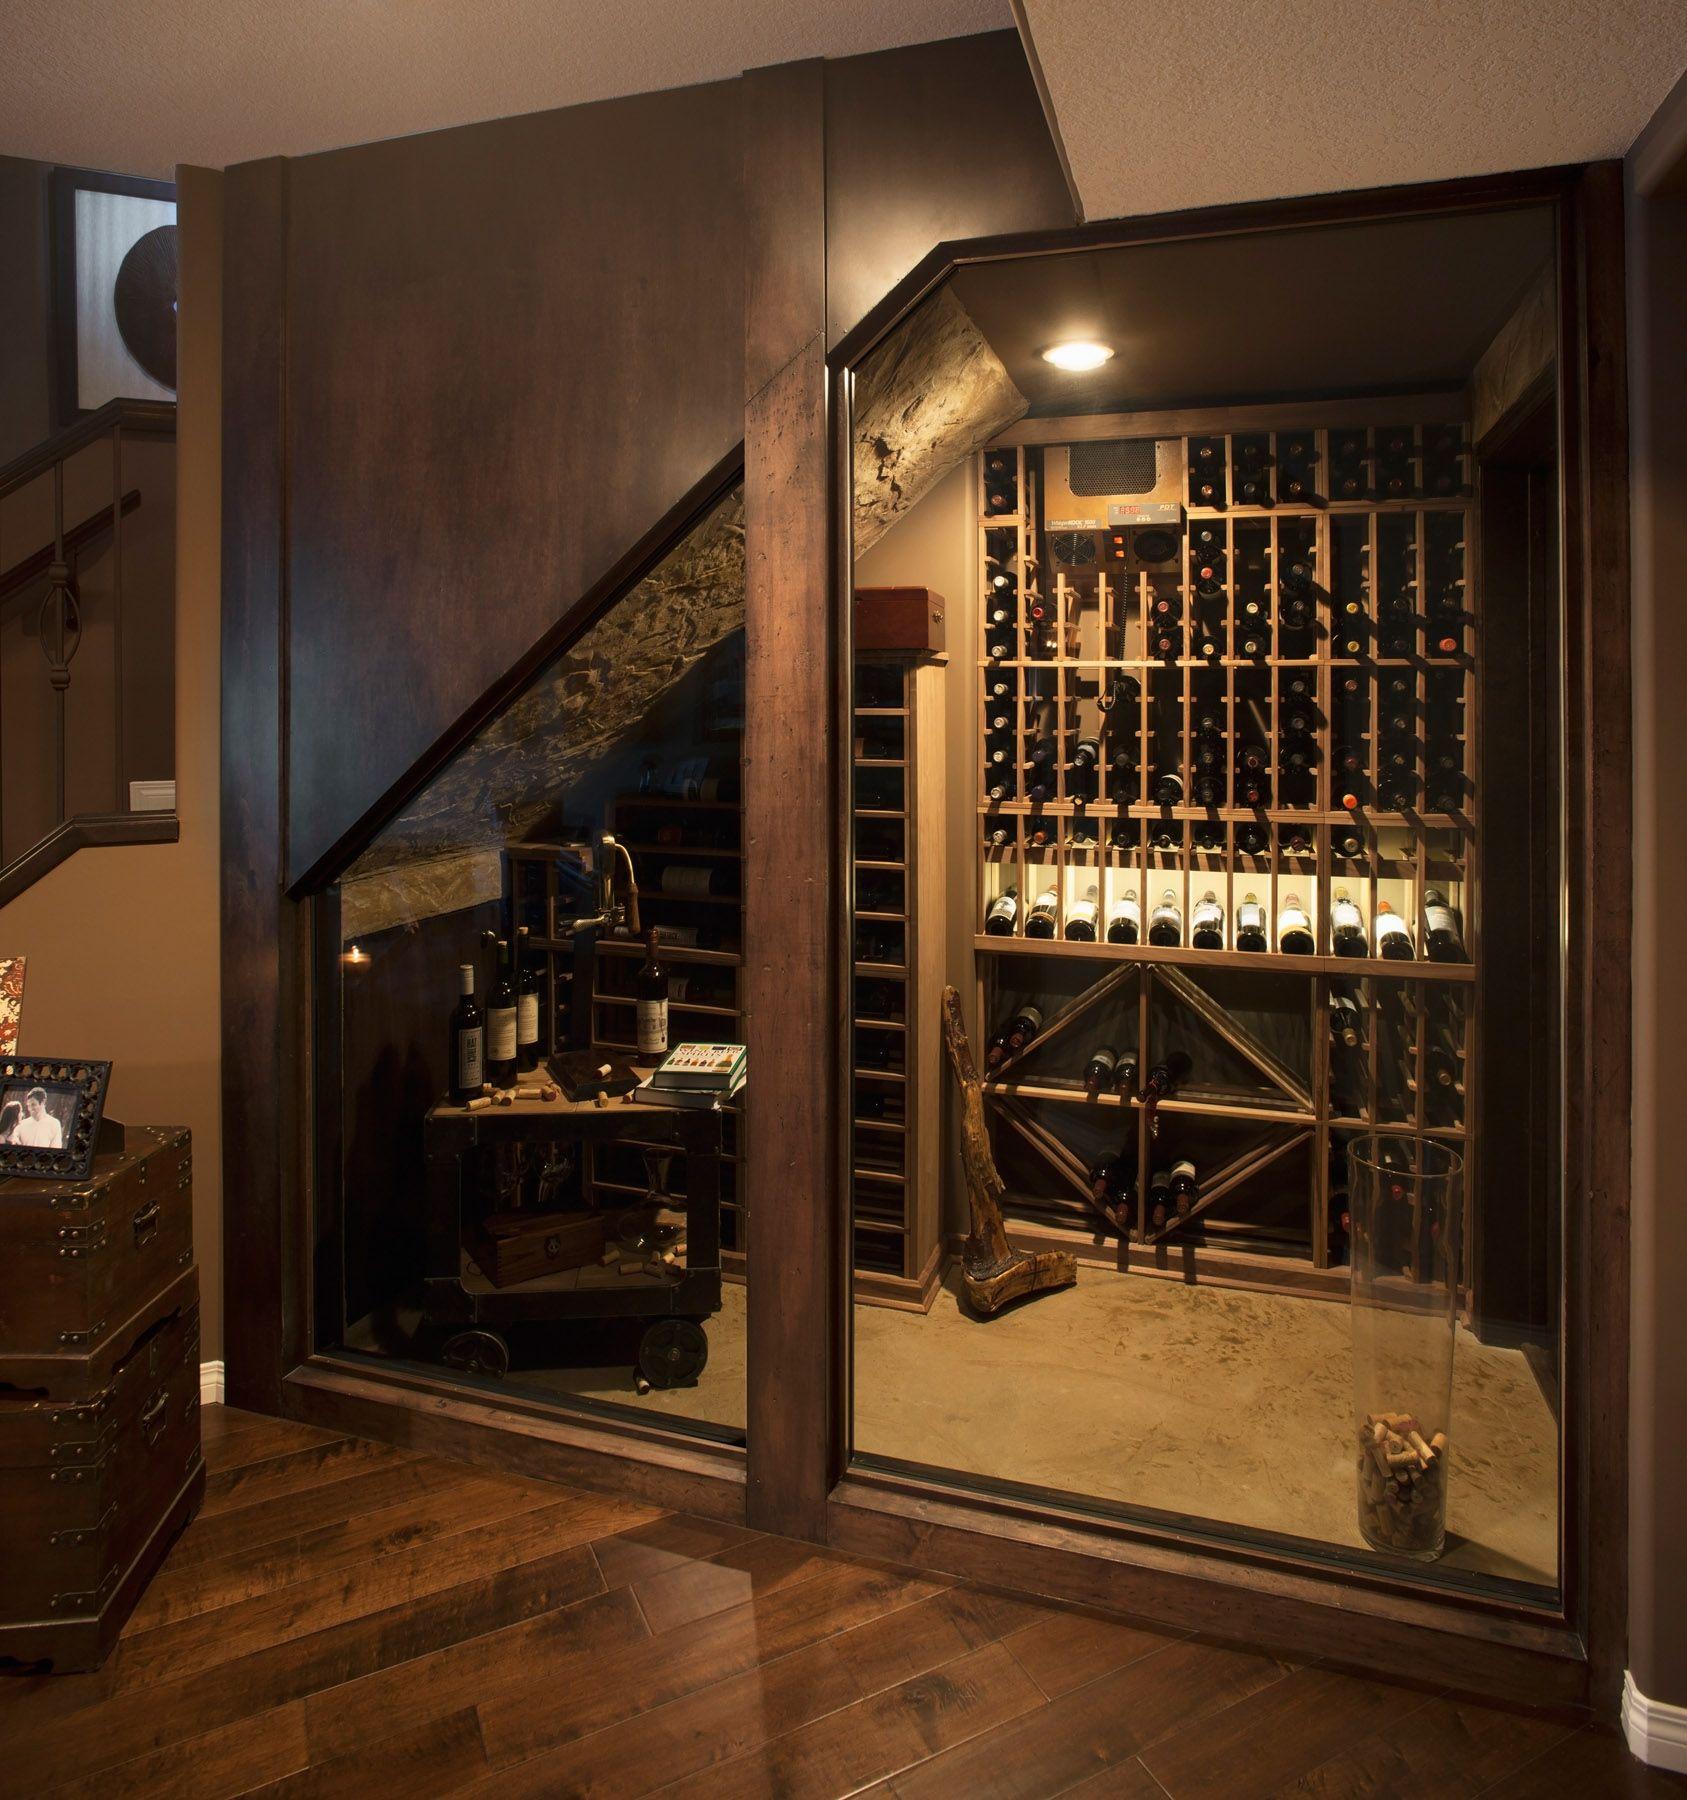 Basement Development - Wine Cellar | por1 | Pinterest